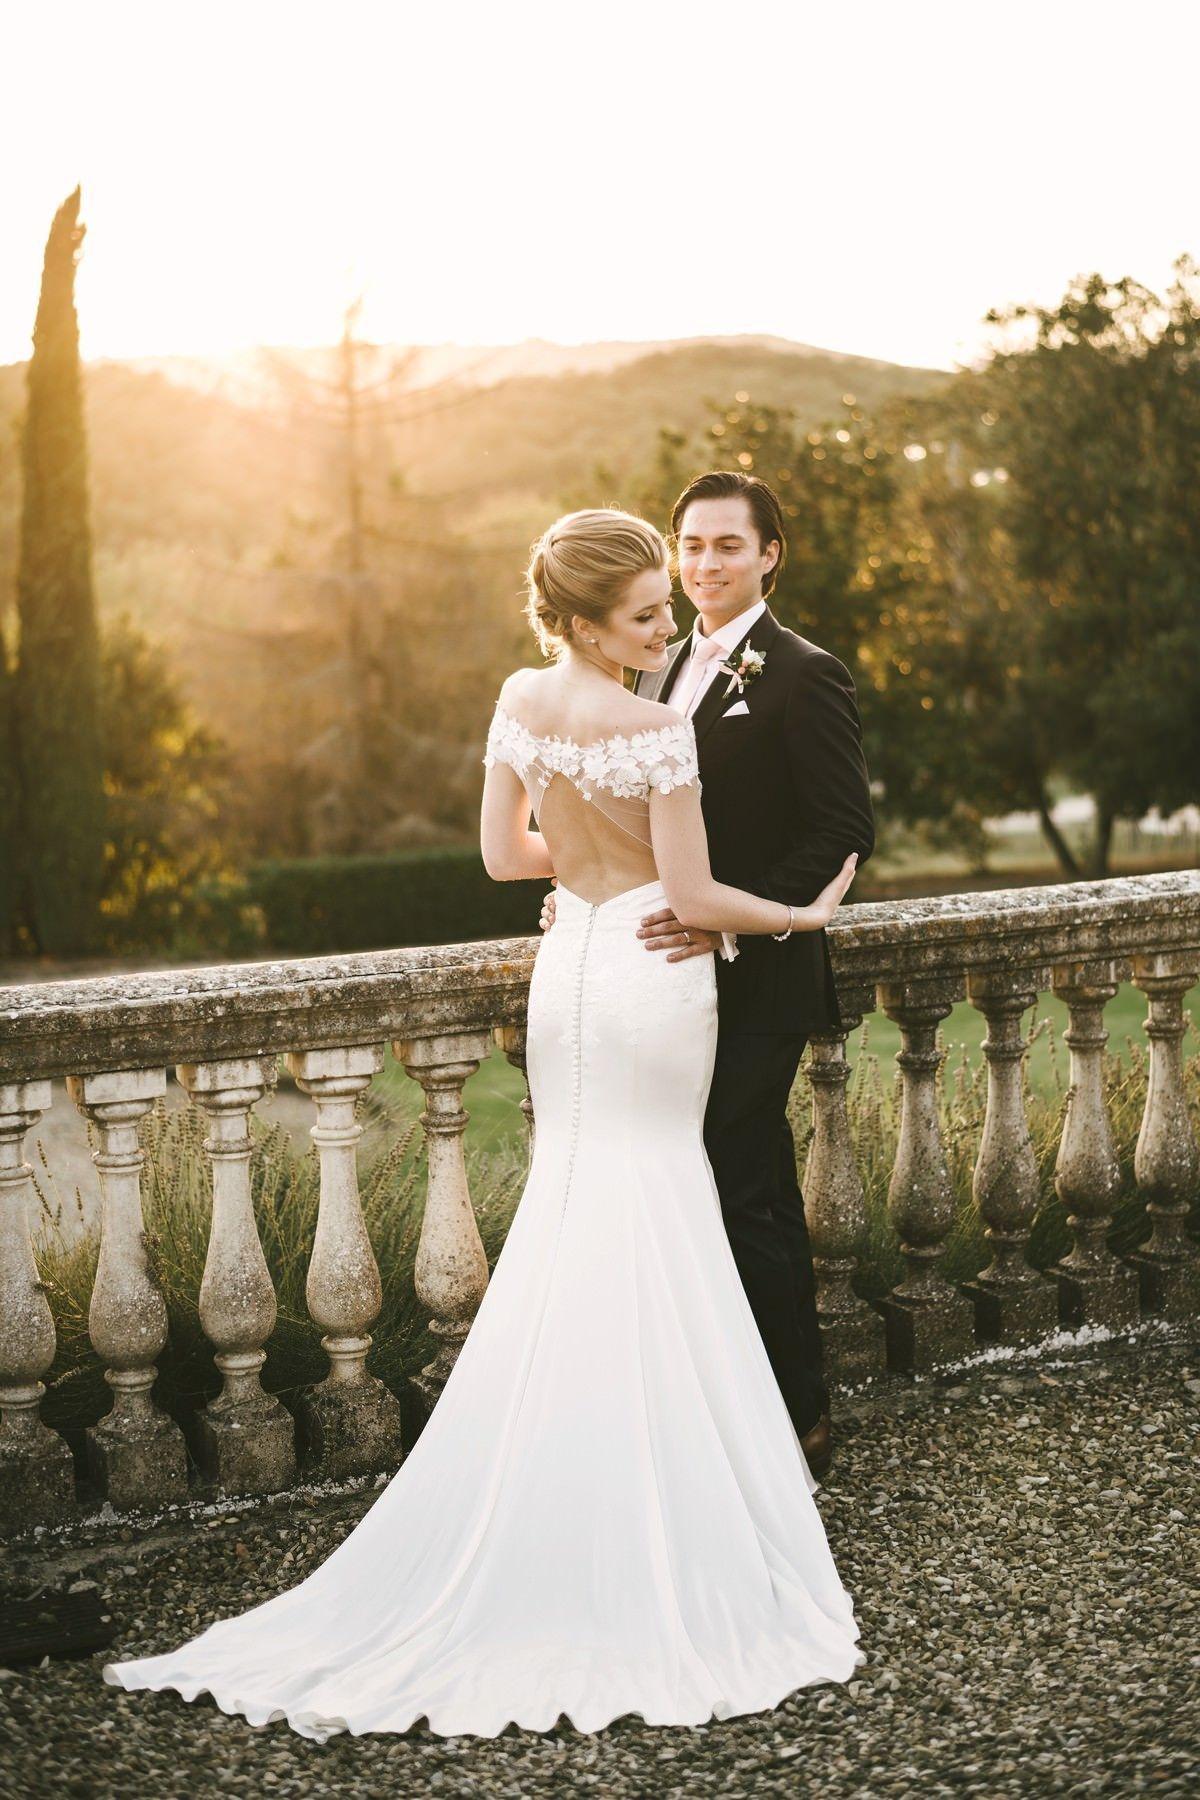 Intimate Wedding Wonderful Setup Let The Romance Take Over Dream Wedding Just Yo Kelly Faetanini Wedding Dresses Designer Wedding Gowns Unique Wedding Gowns